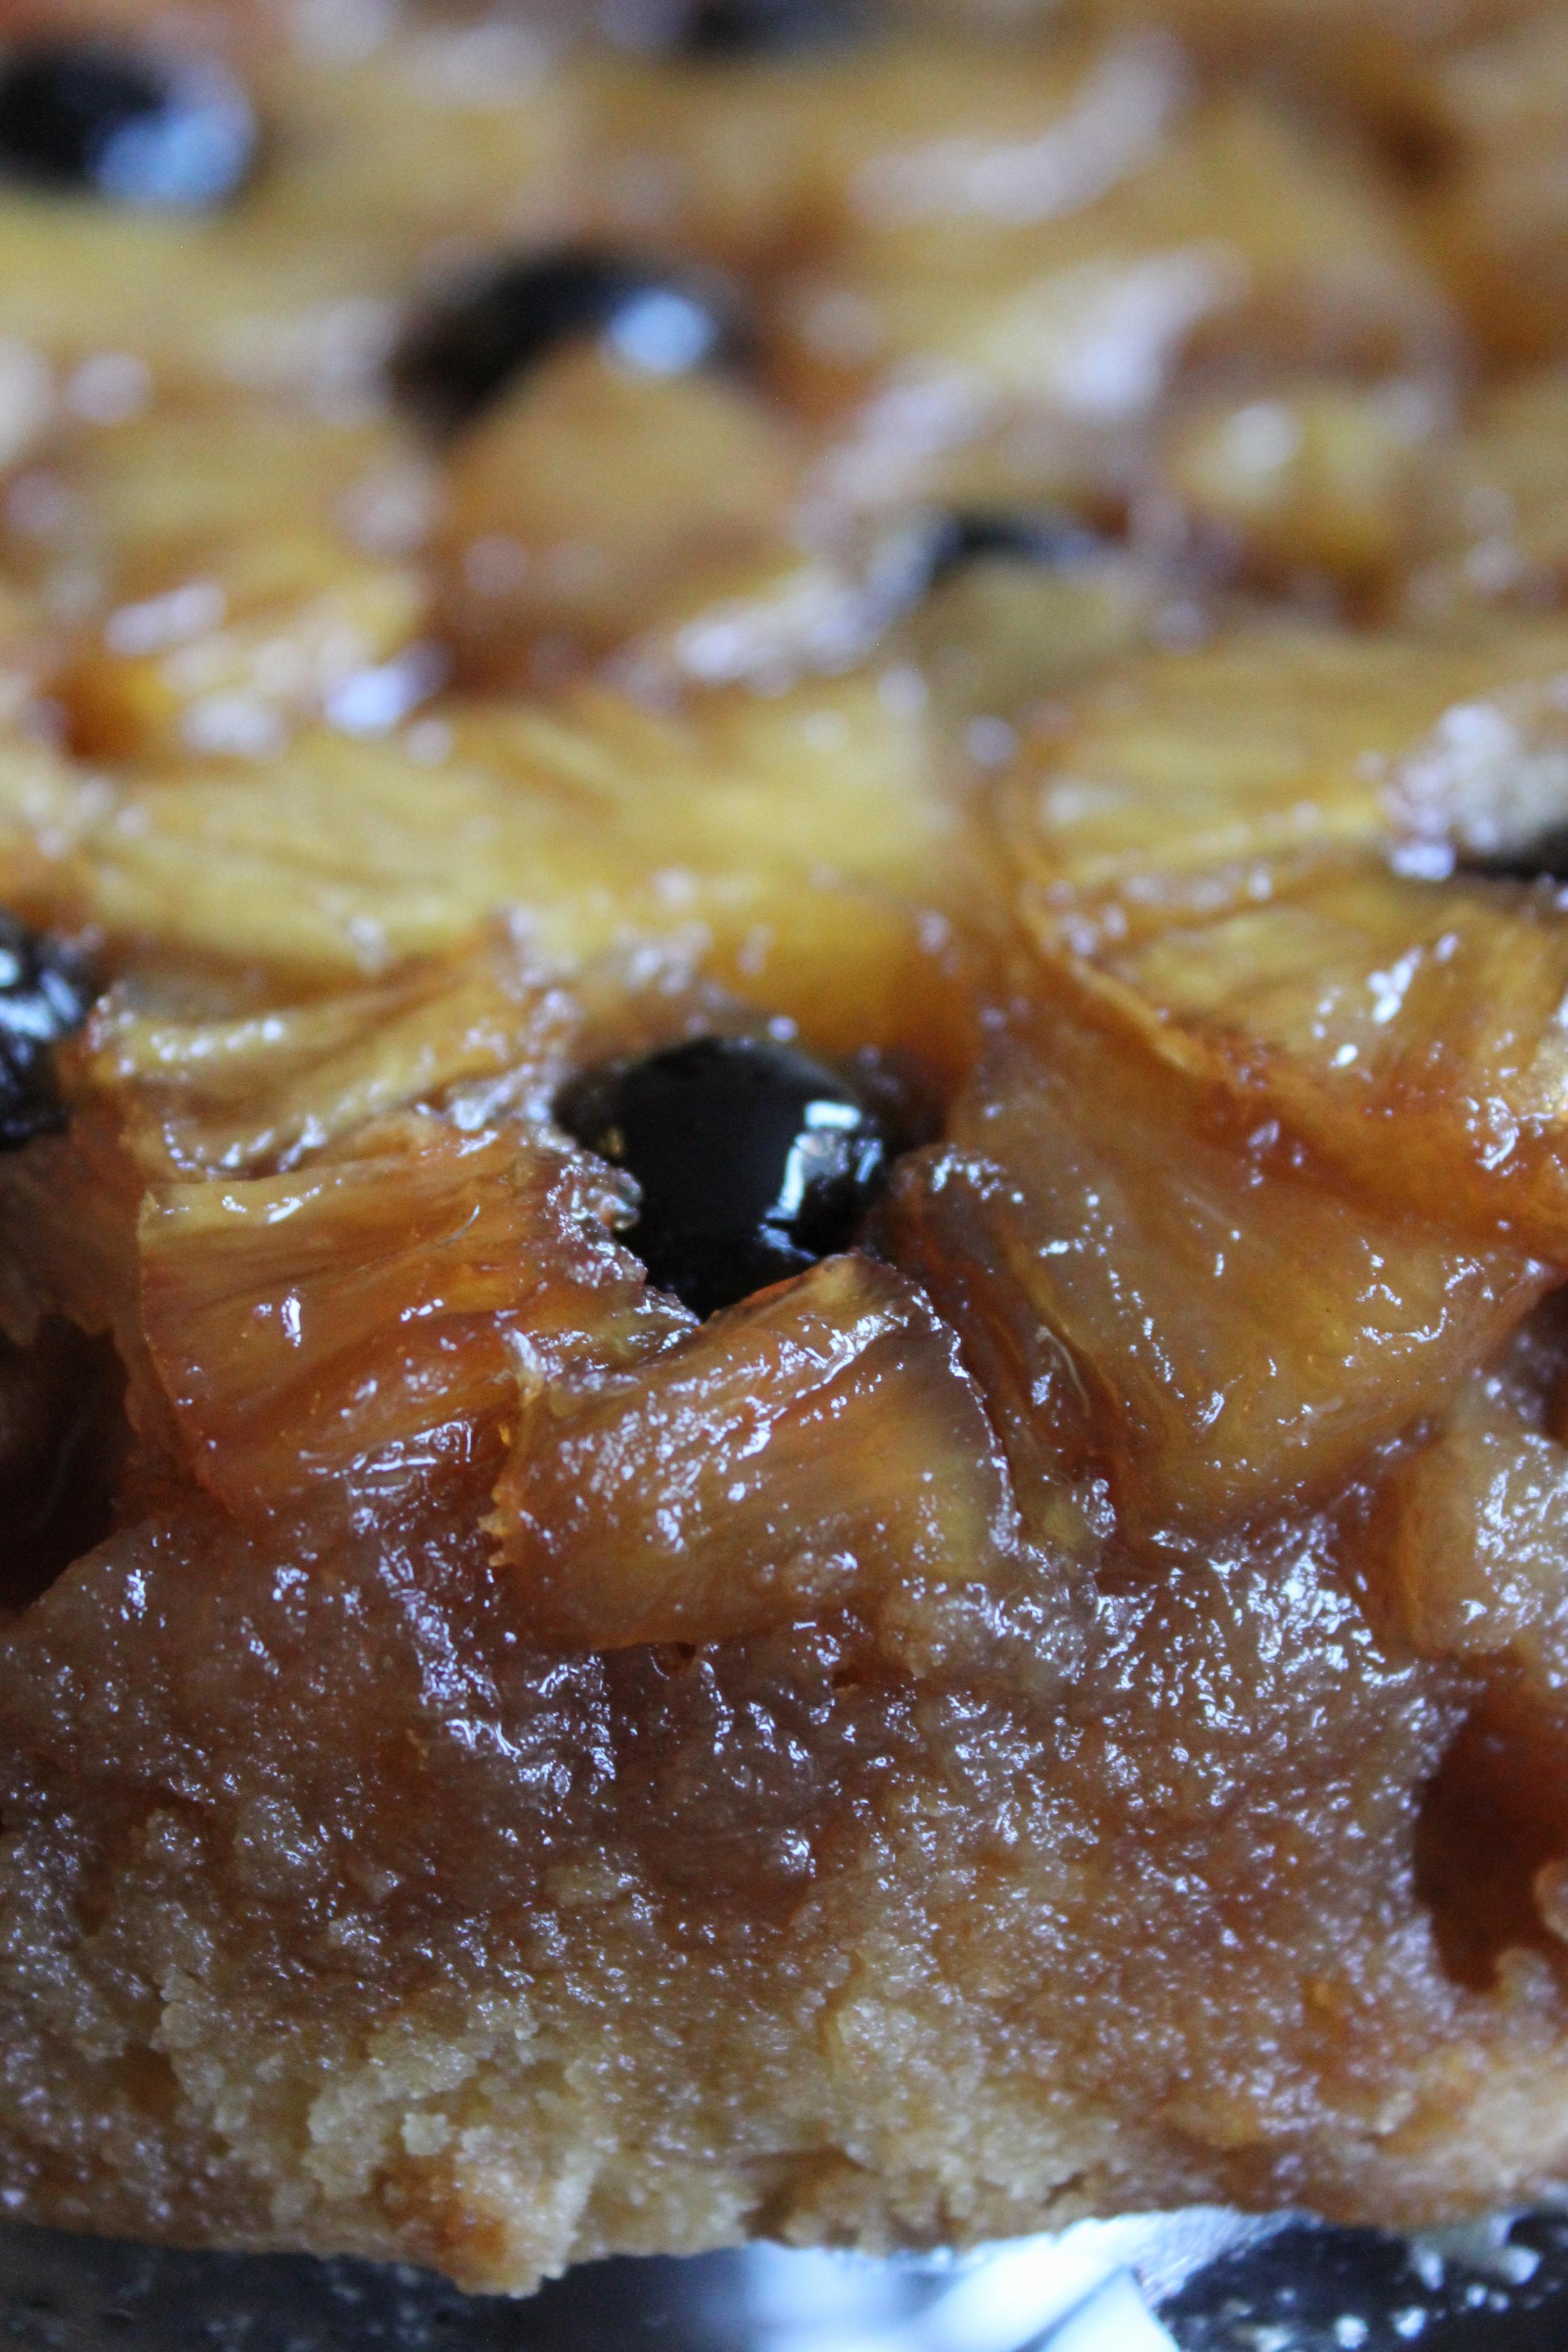 Pineapple Upside-Down Cake by Thomas Keller